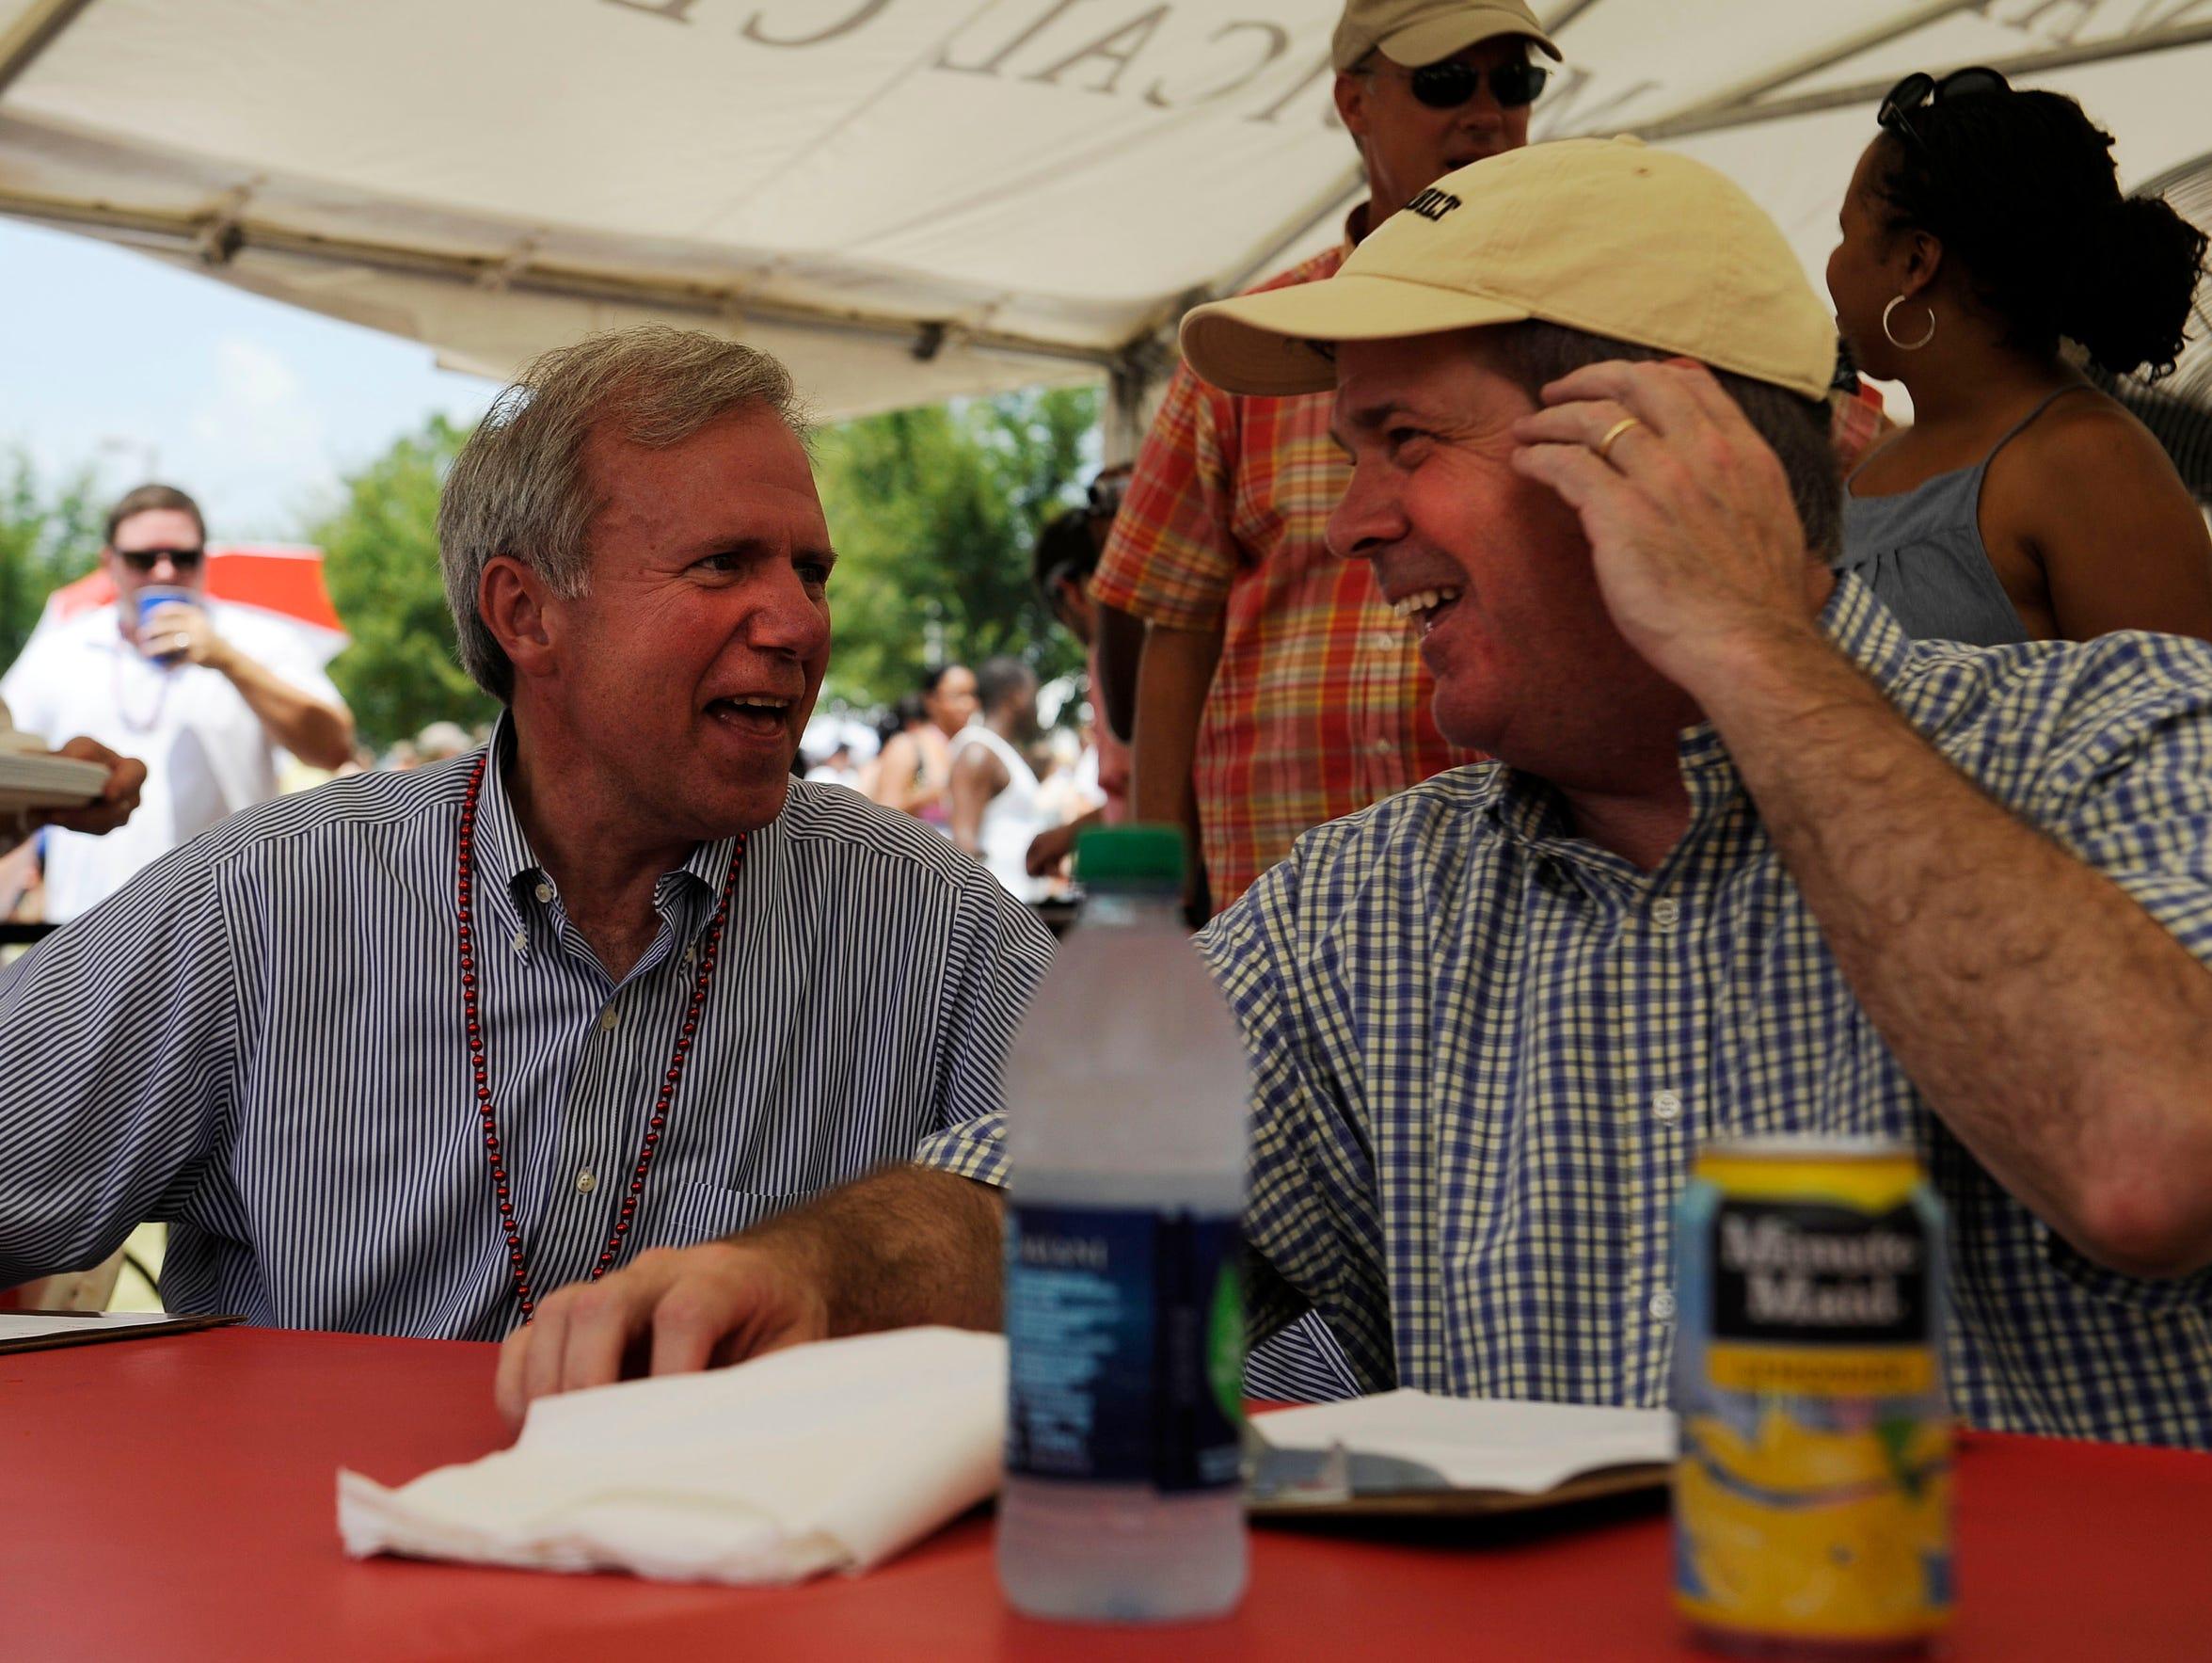 Former Nashville Mayor Bill Purcell, left, laughs with